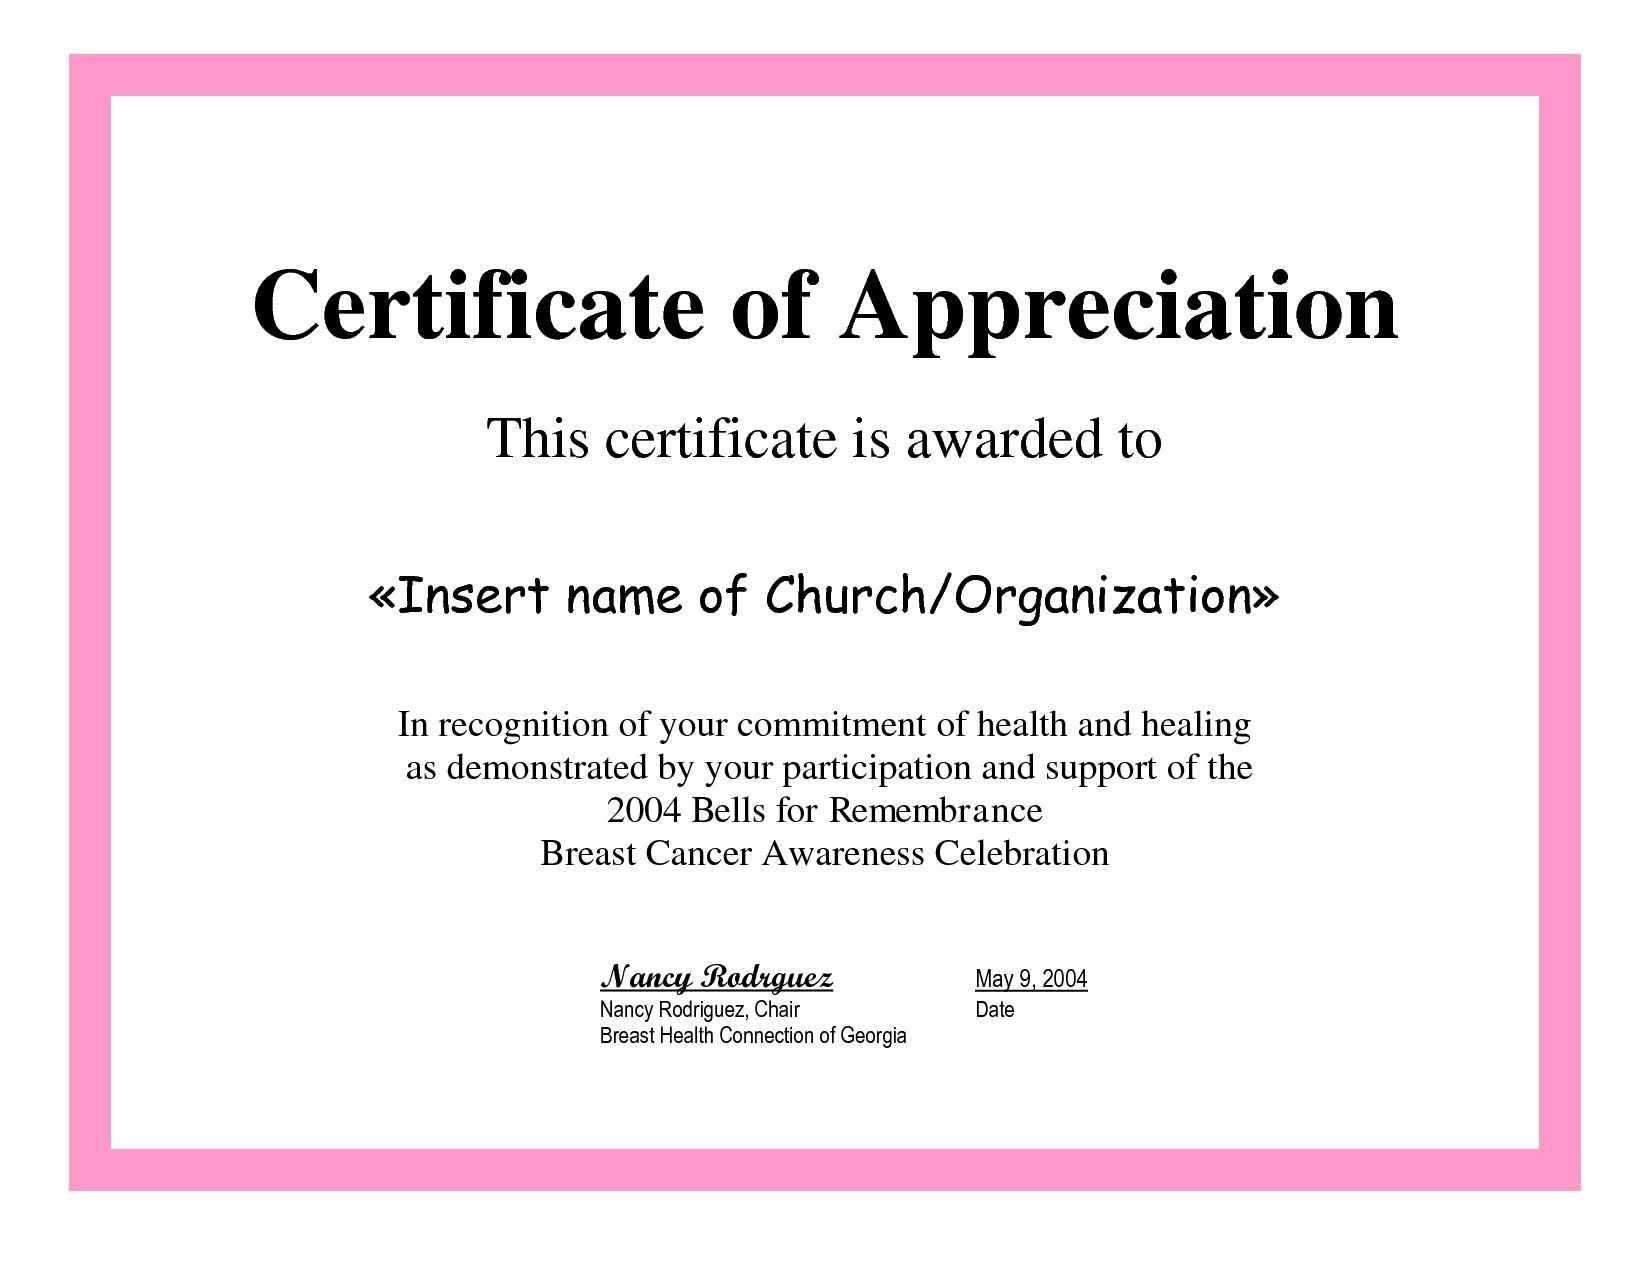 Farewell Certificate Template - Atlantaauctionco Throughout Farewell Certificate Template